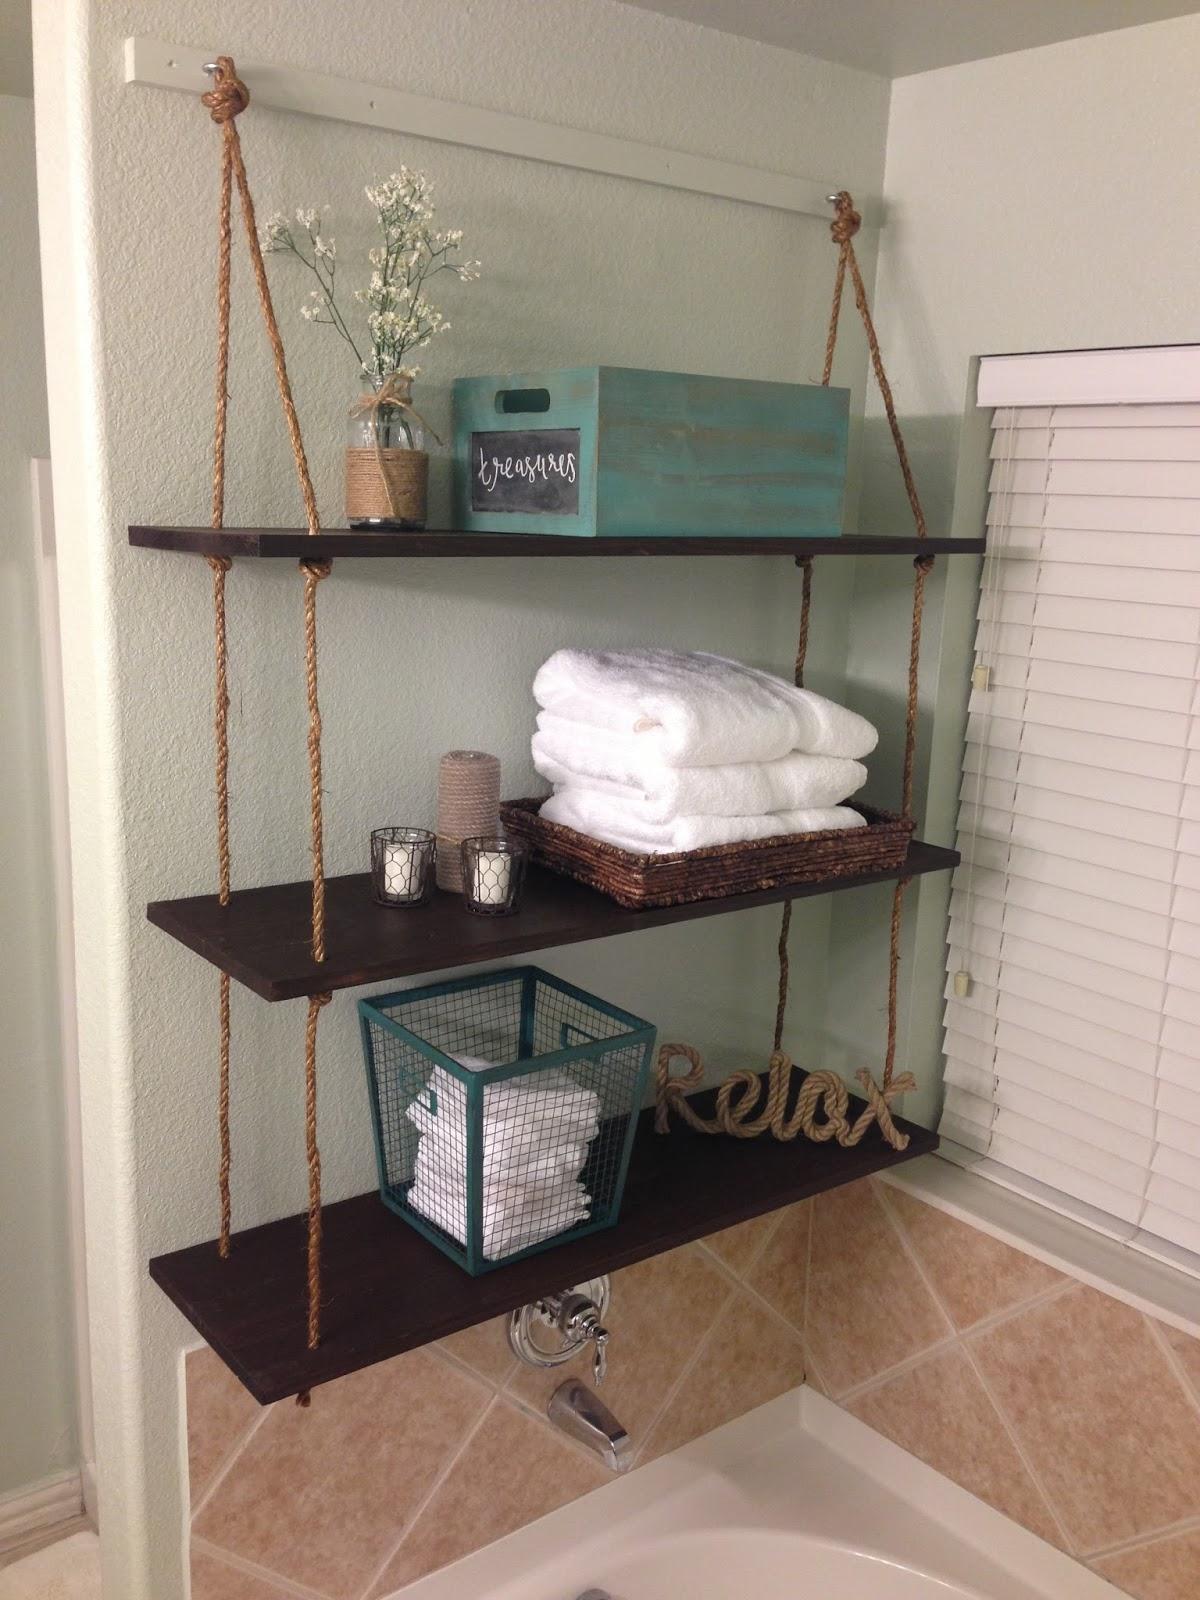 mon ami createry diy rope shelves. Black Bedroom Furniture Sets. Home Design Ideas